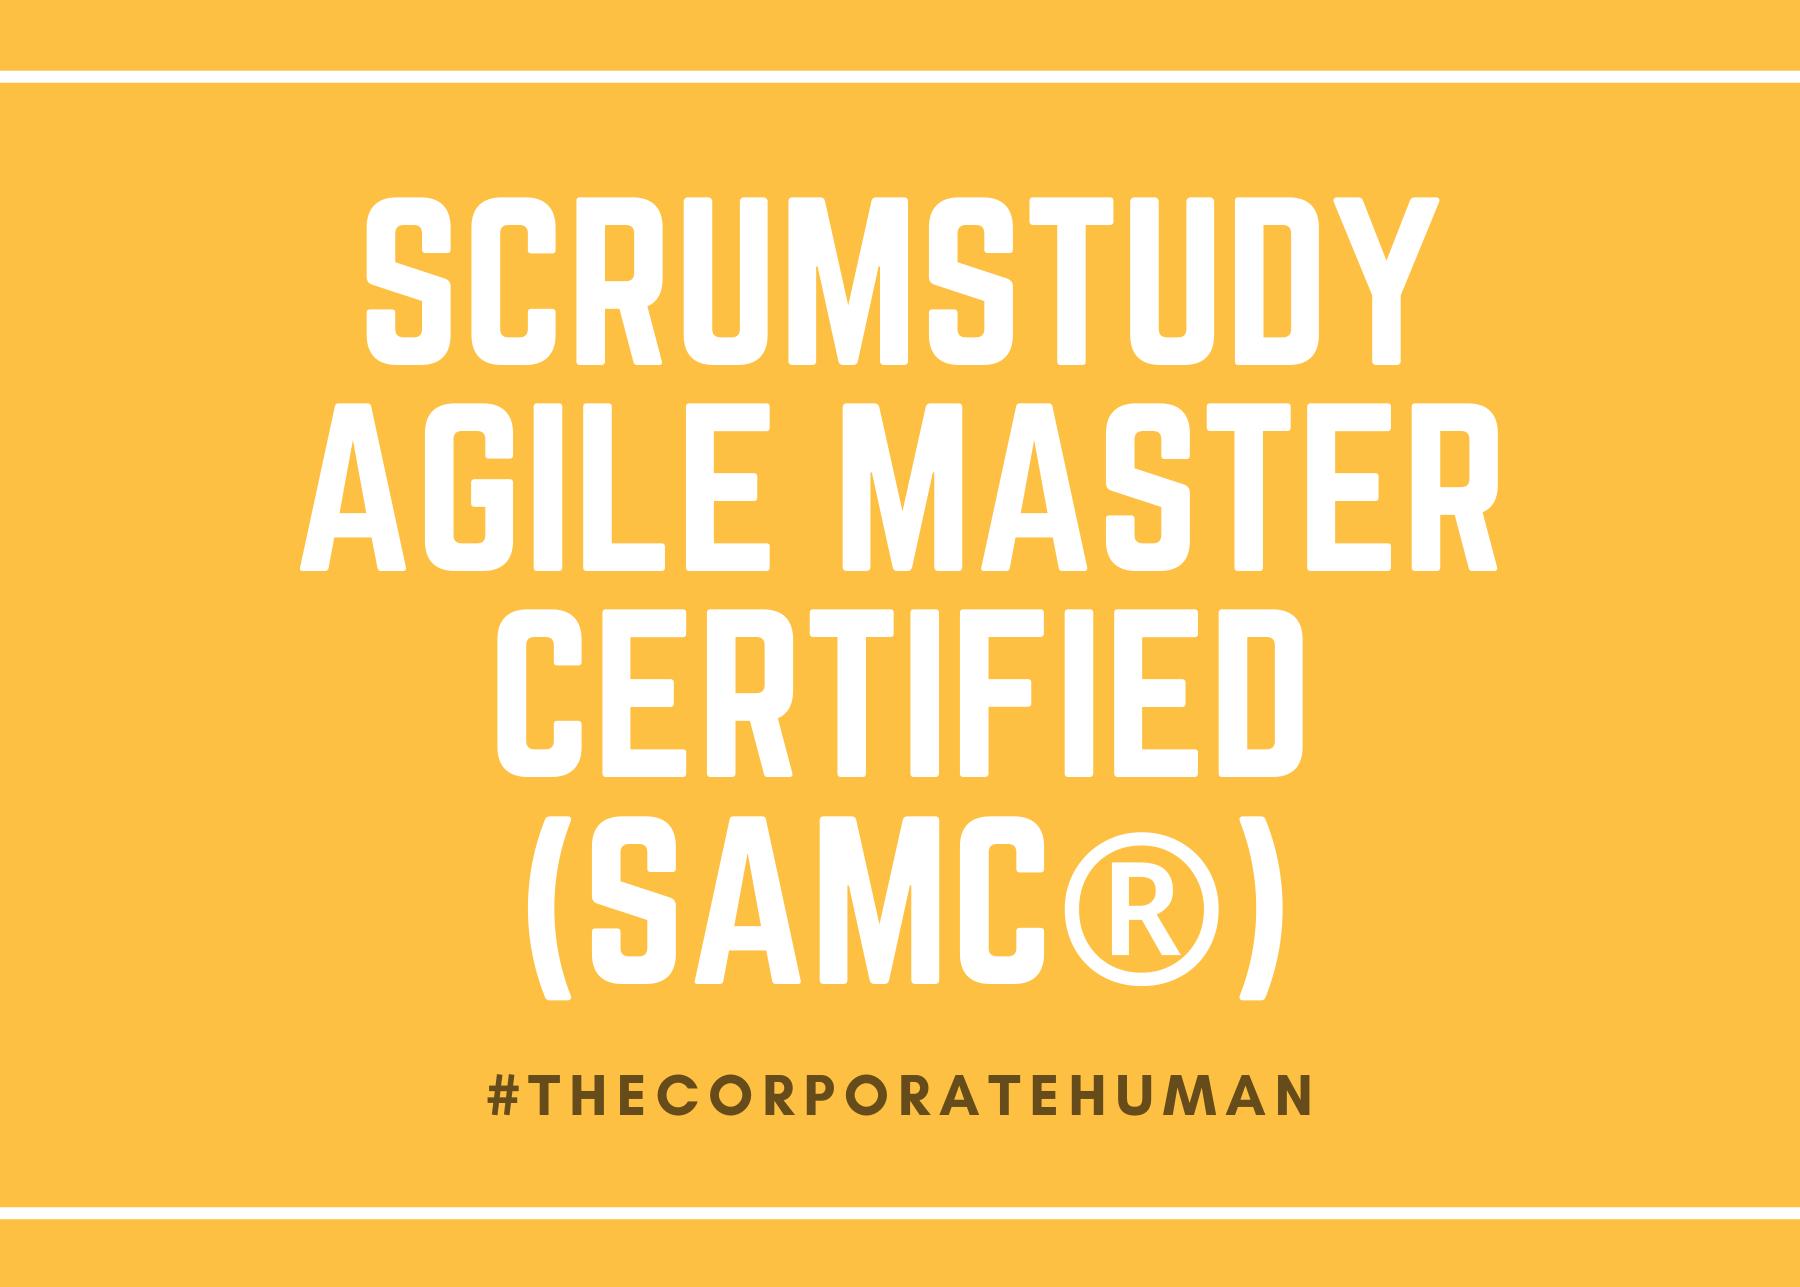 SCRUMStudy Agile Master Certified (SAMC®)